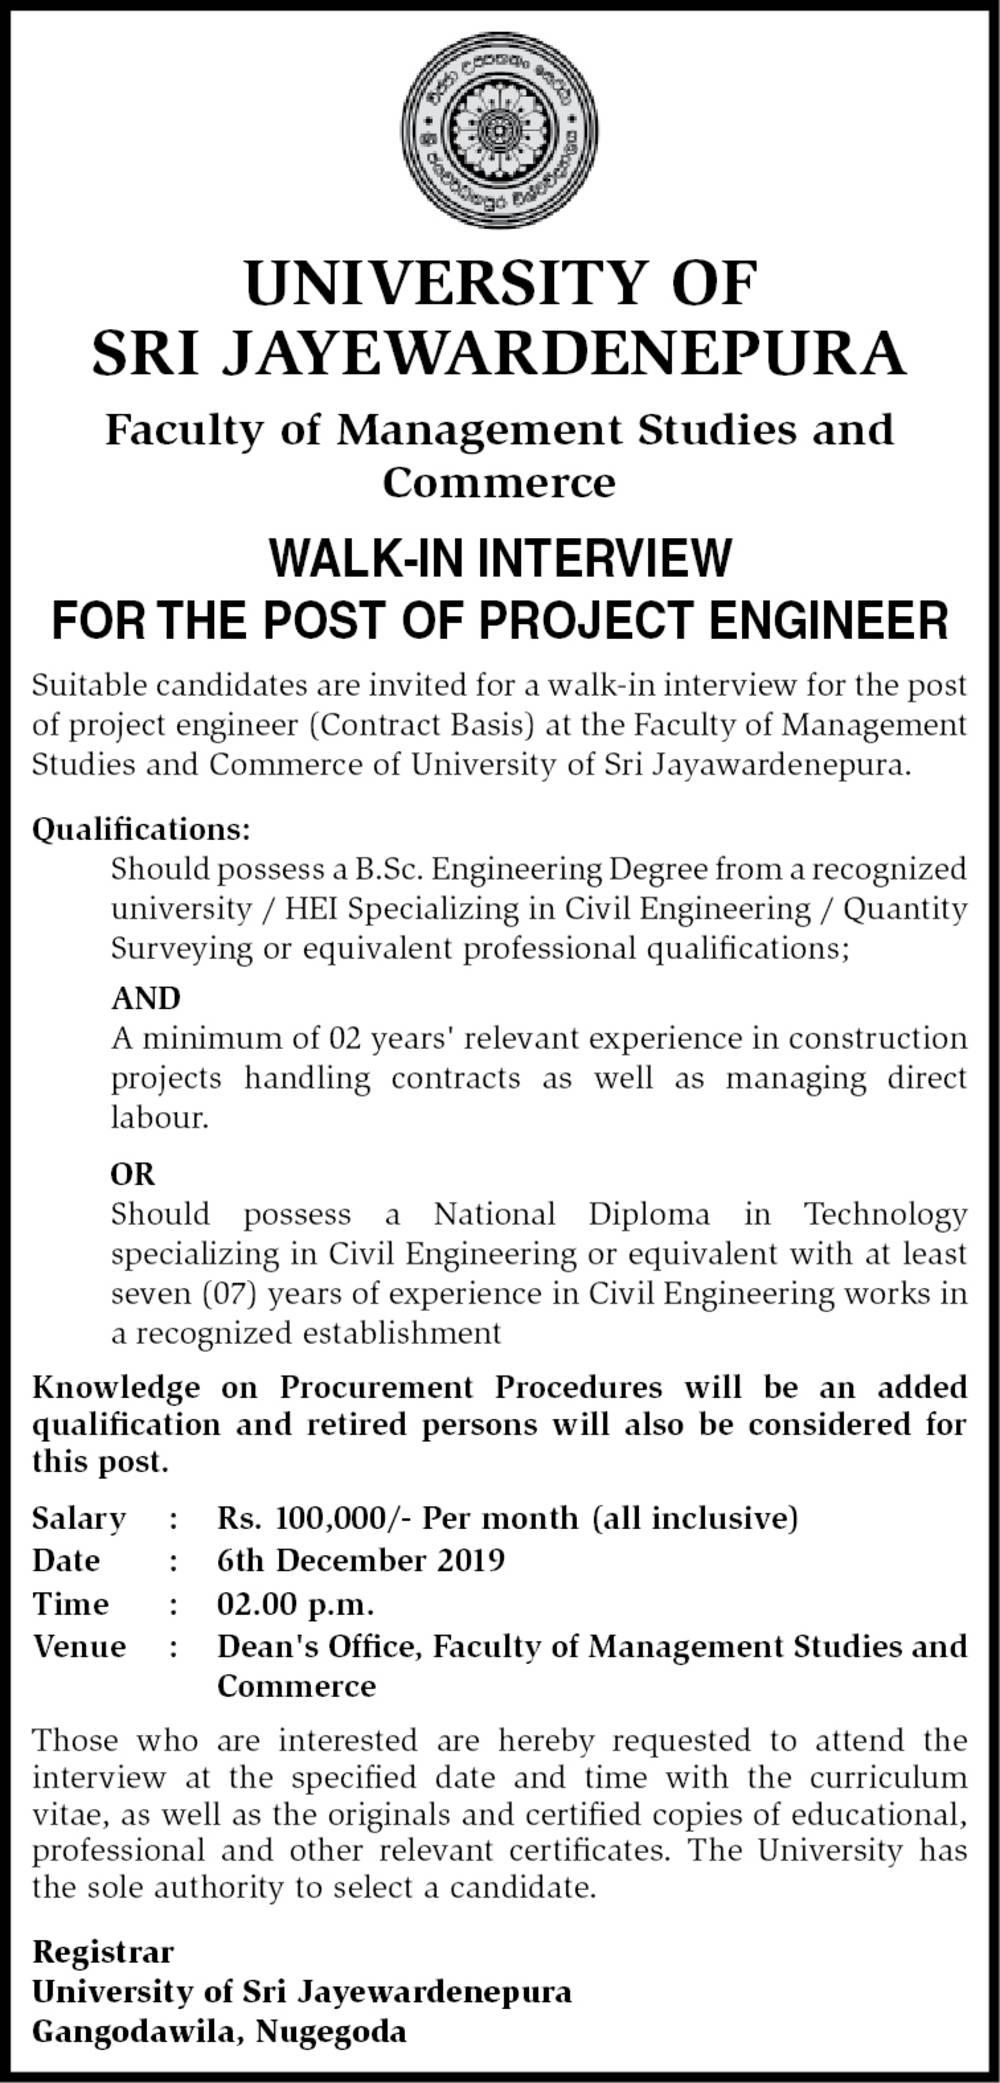 Project Engineer - University of Sri Jayawardanapura